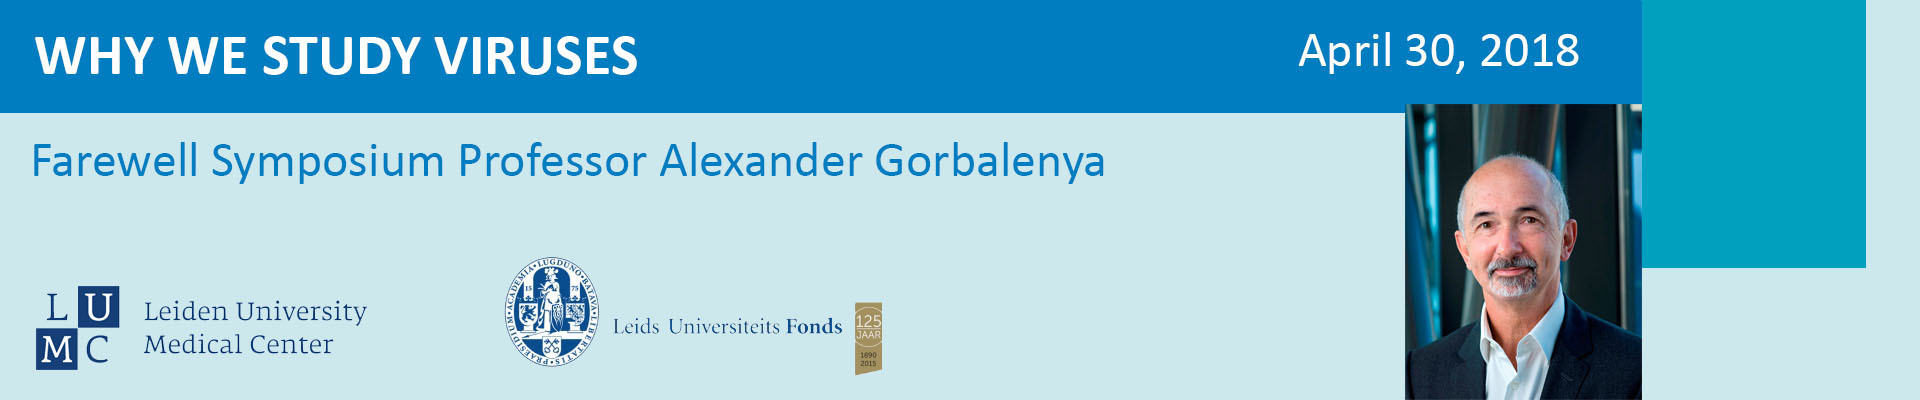 Farewell Symposium and dinner Alexander Gorbalenya - April 30, 2018 (Kopie)